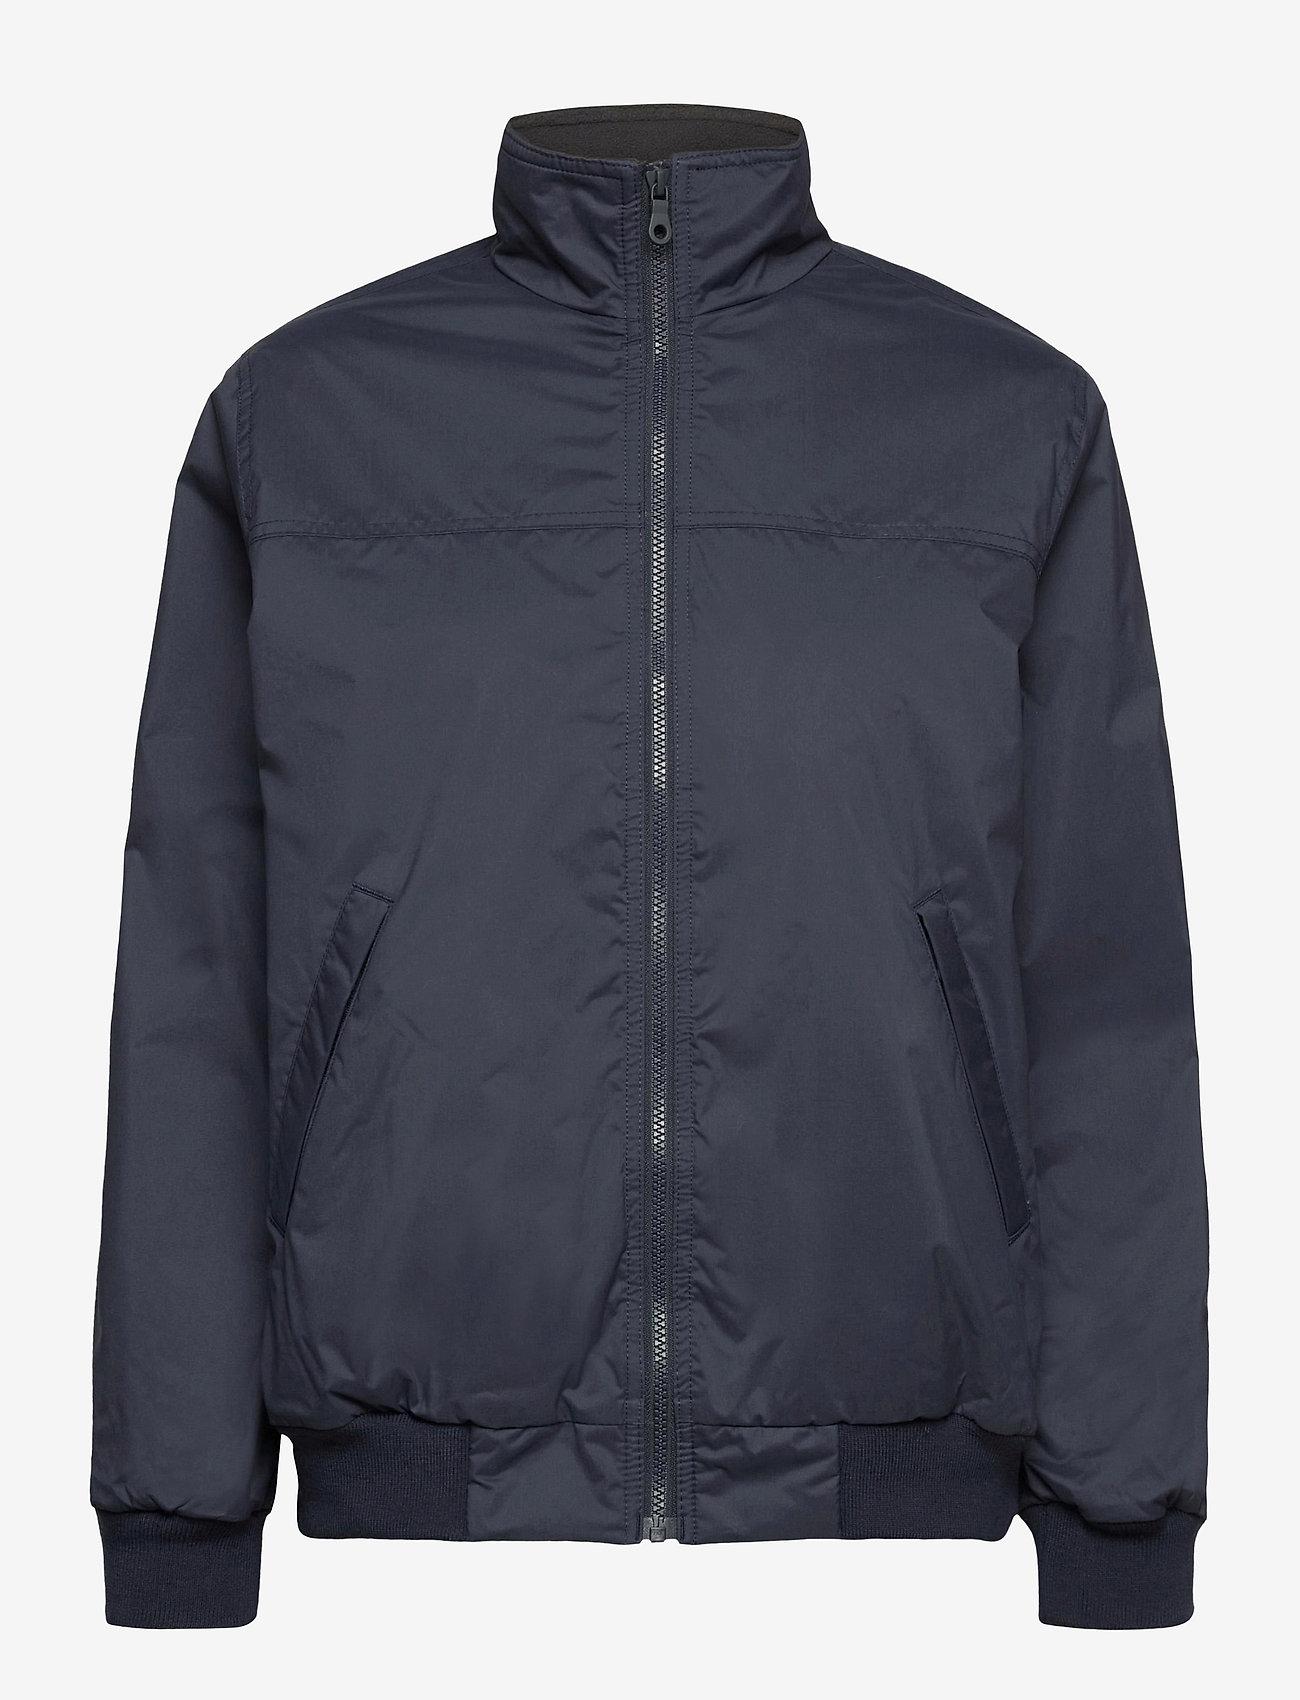 Musto - CLASSIC SNUG BLOUSON JKT FW - sports jackets - true navy/cinder - 0